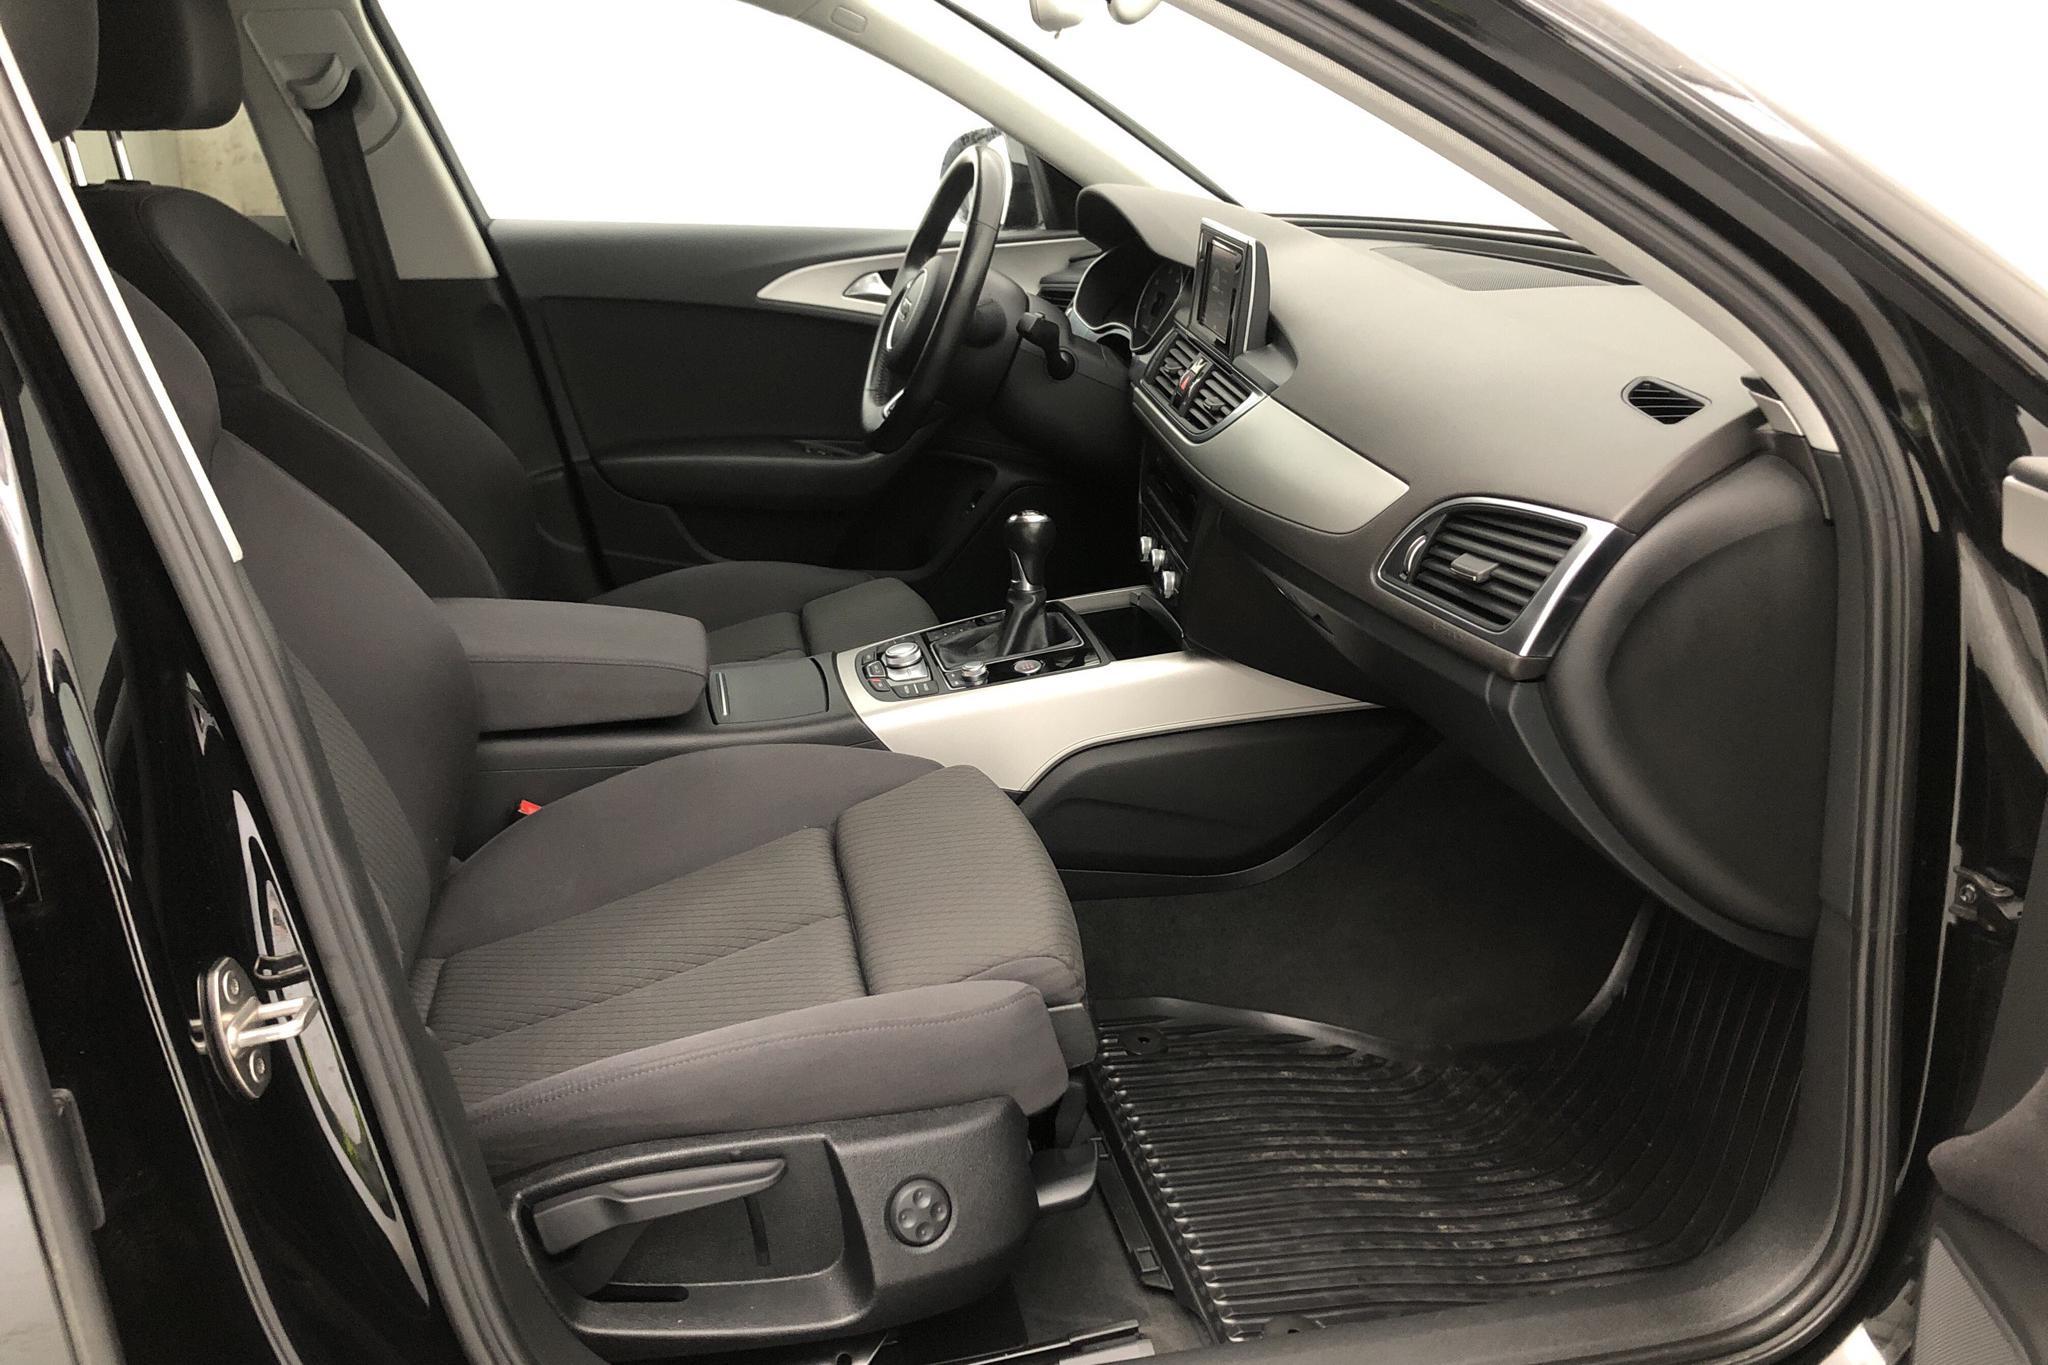 Audi A6 2.0 TDI (190hk) - 117 250 km - Manual - black - 2017